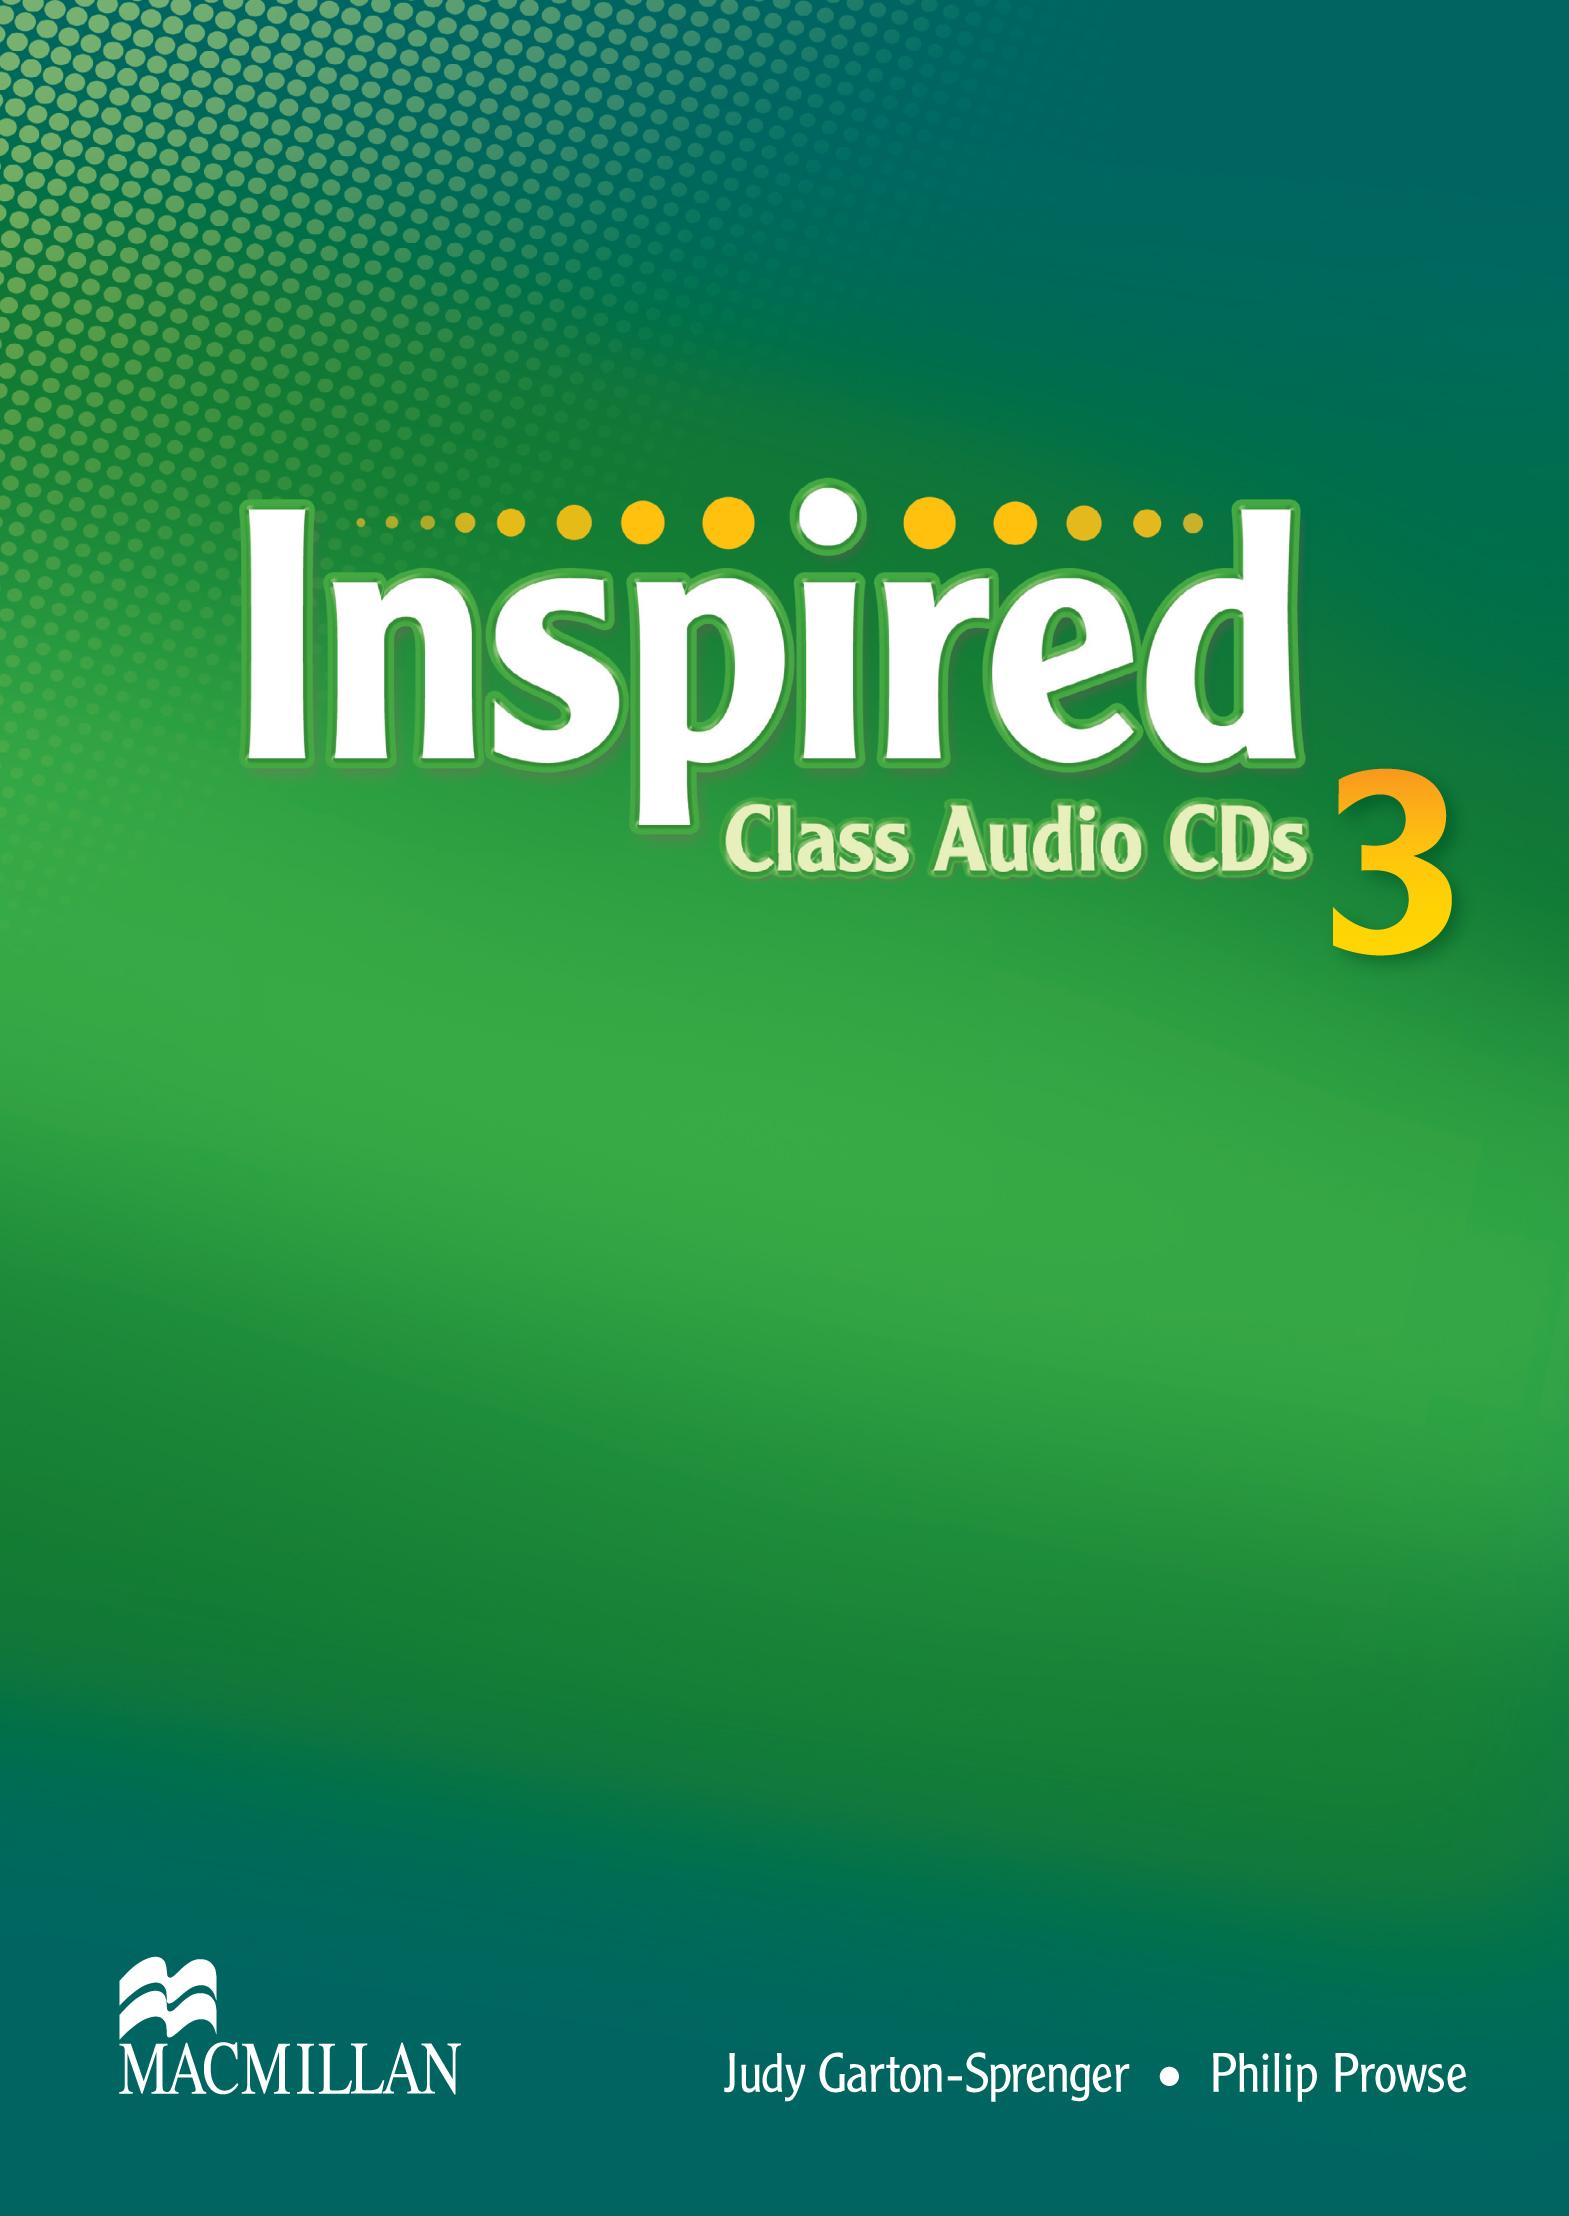 Inspired 3 Class Audio CDs